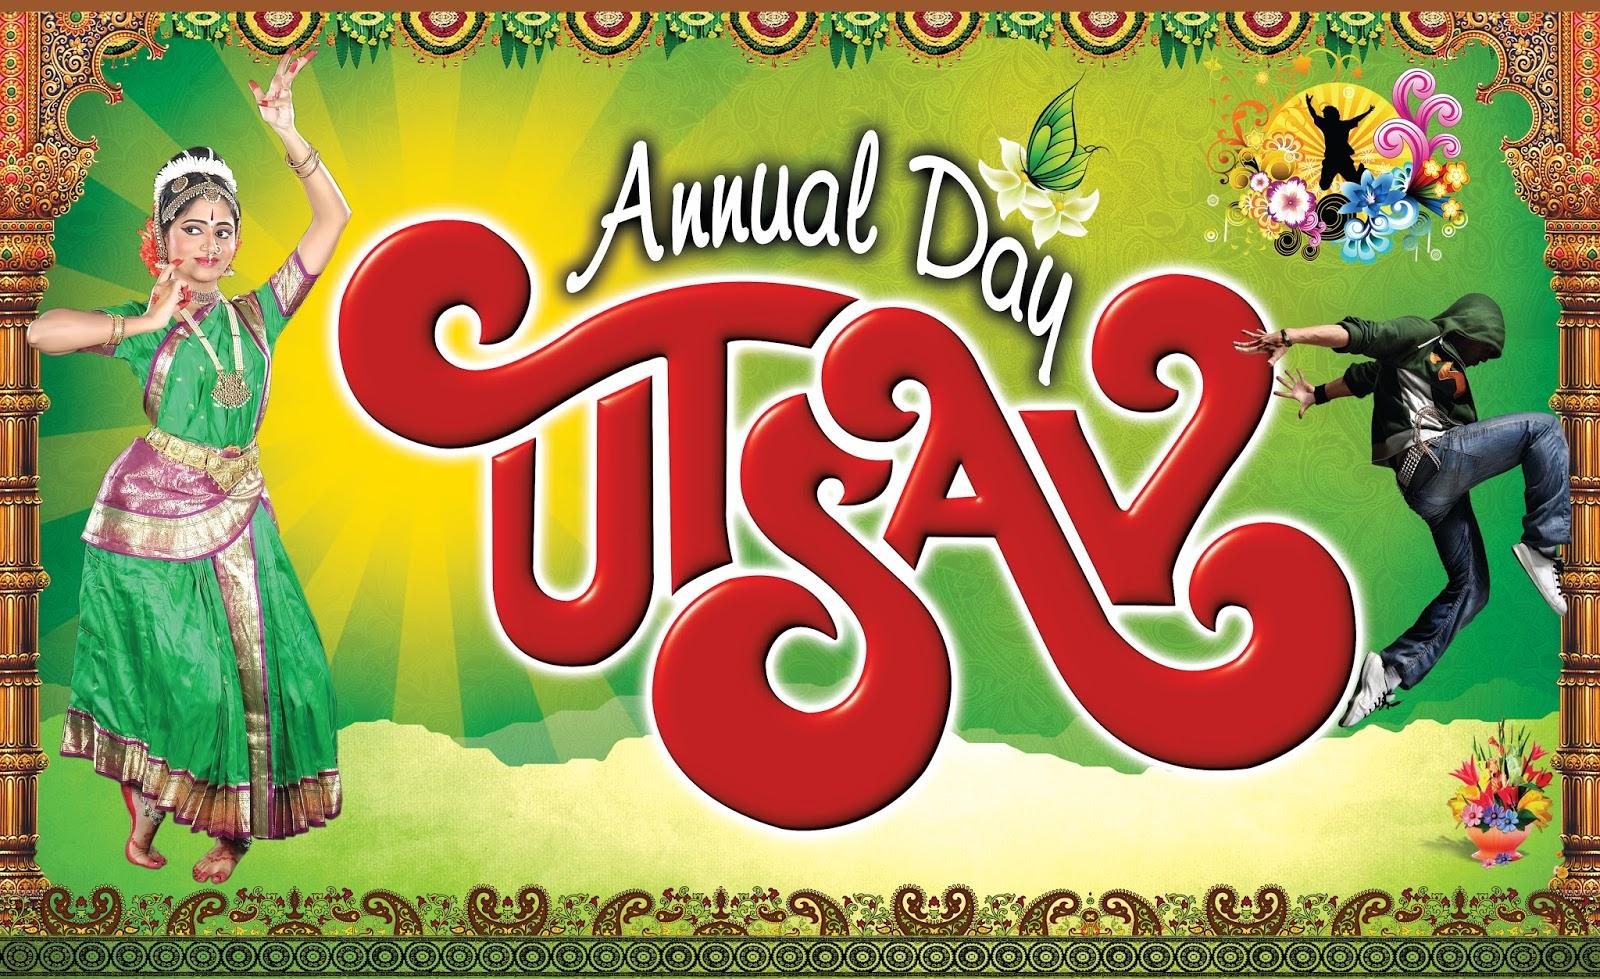 Ceremony clipart school annual day Annualday school download annualday free